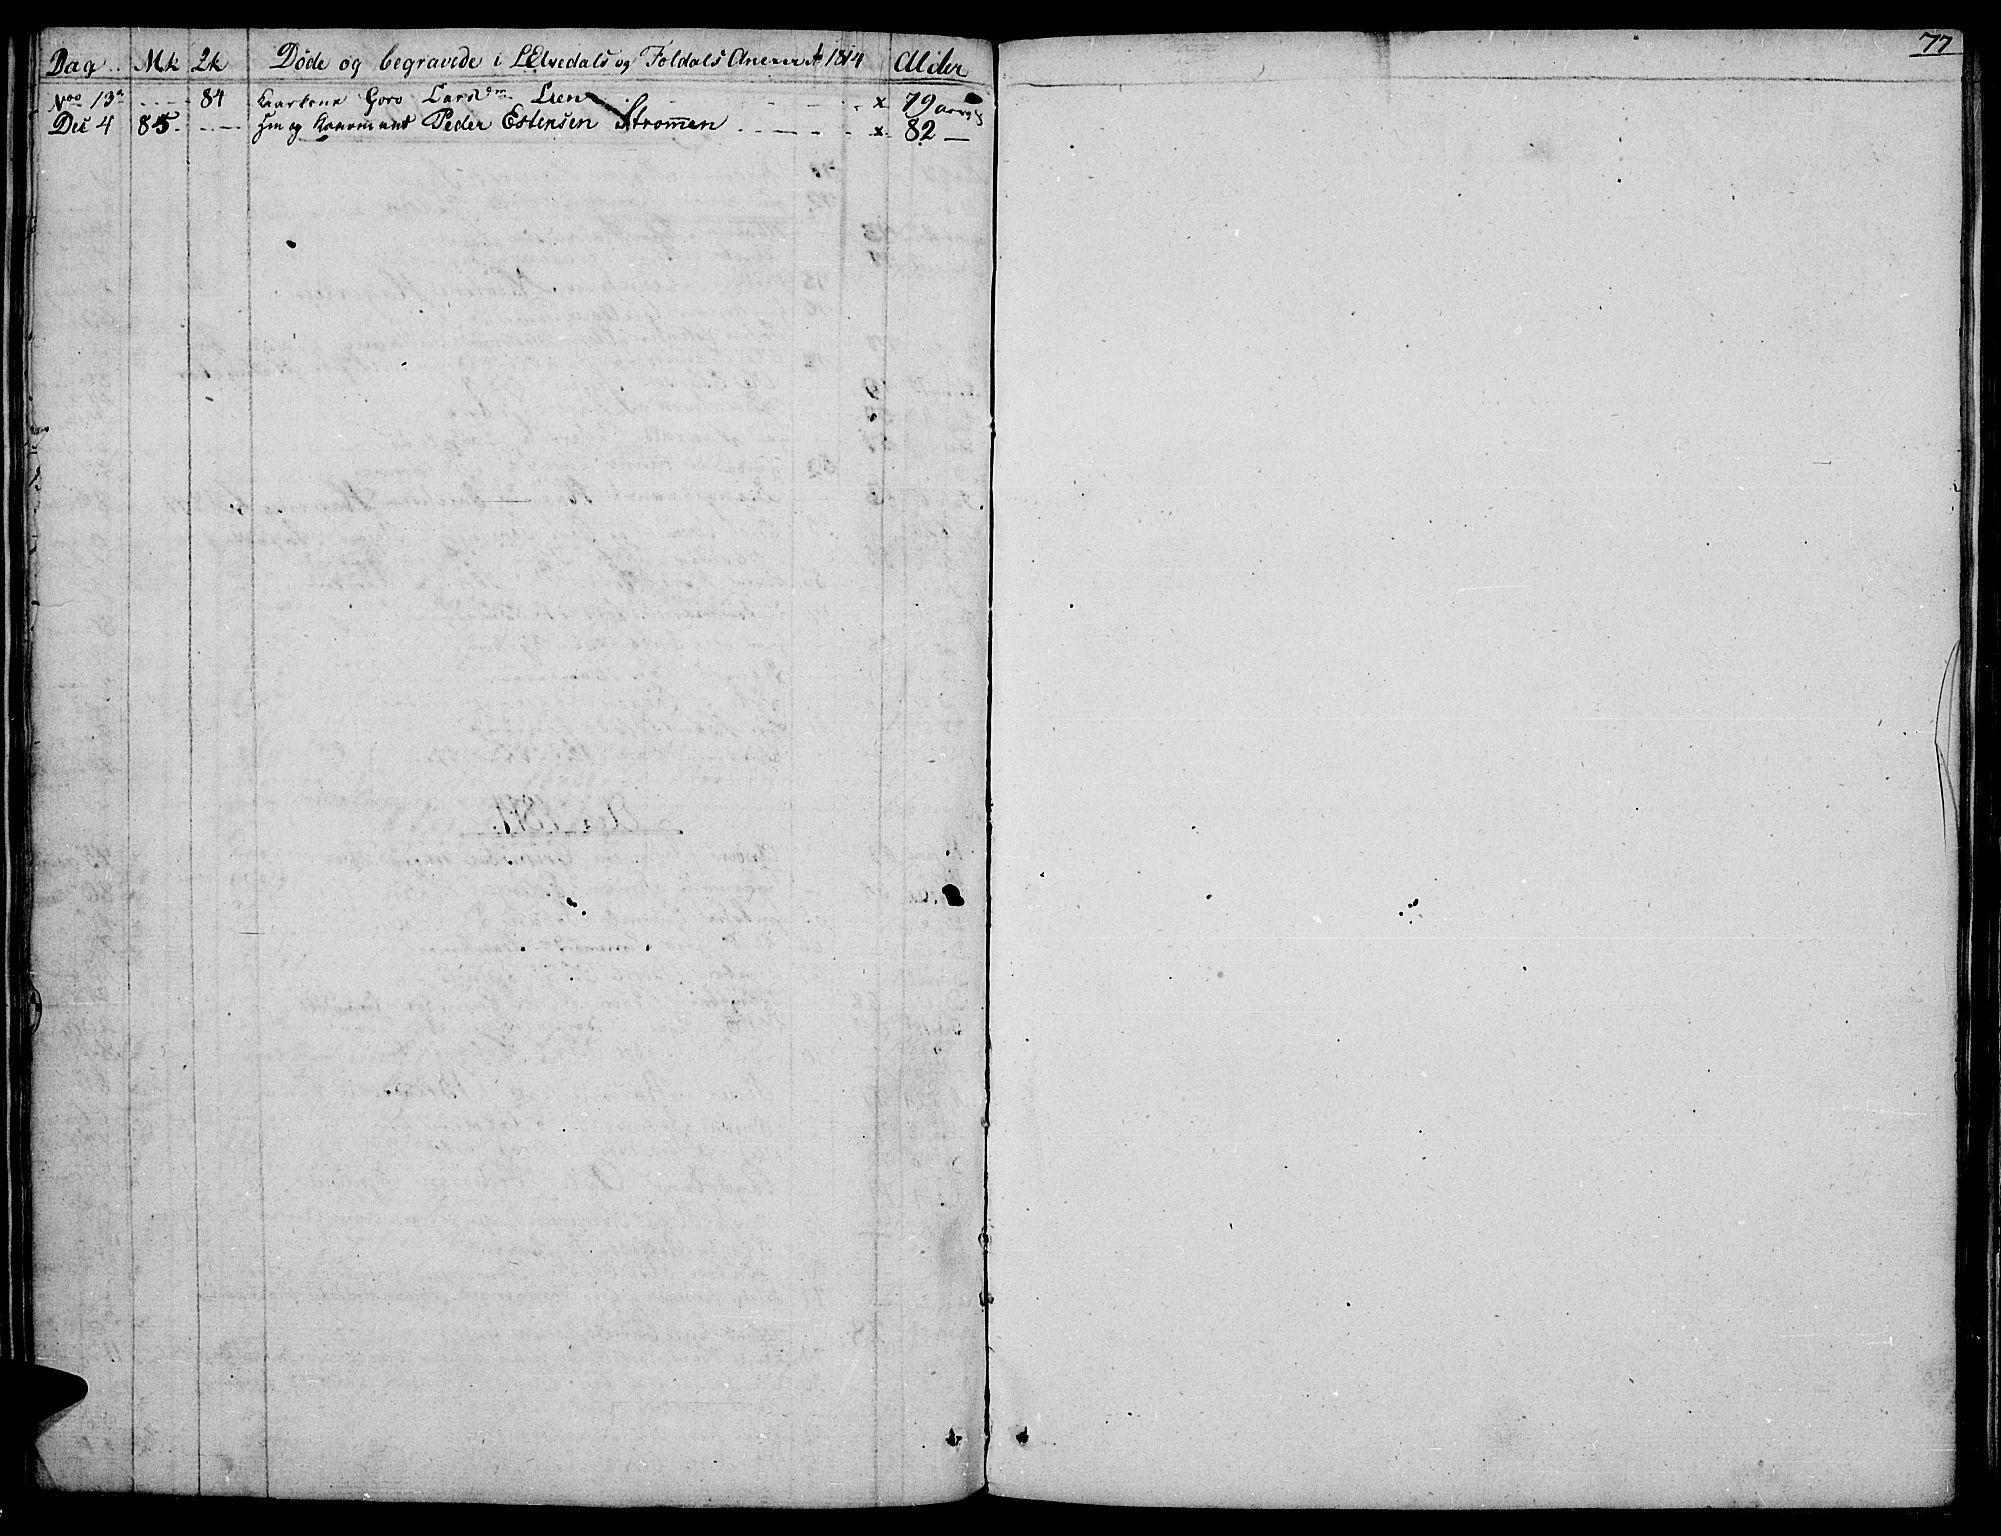 SAH, Tynset prestekontor, Ministerialbok nr. 16, 1801-1814, s. 77